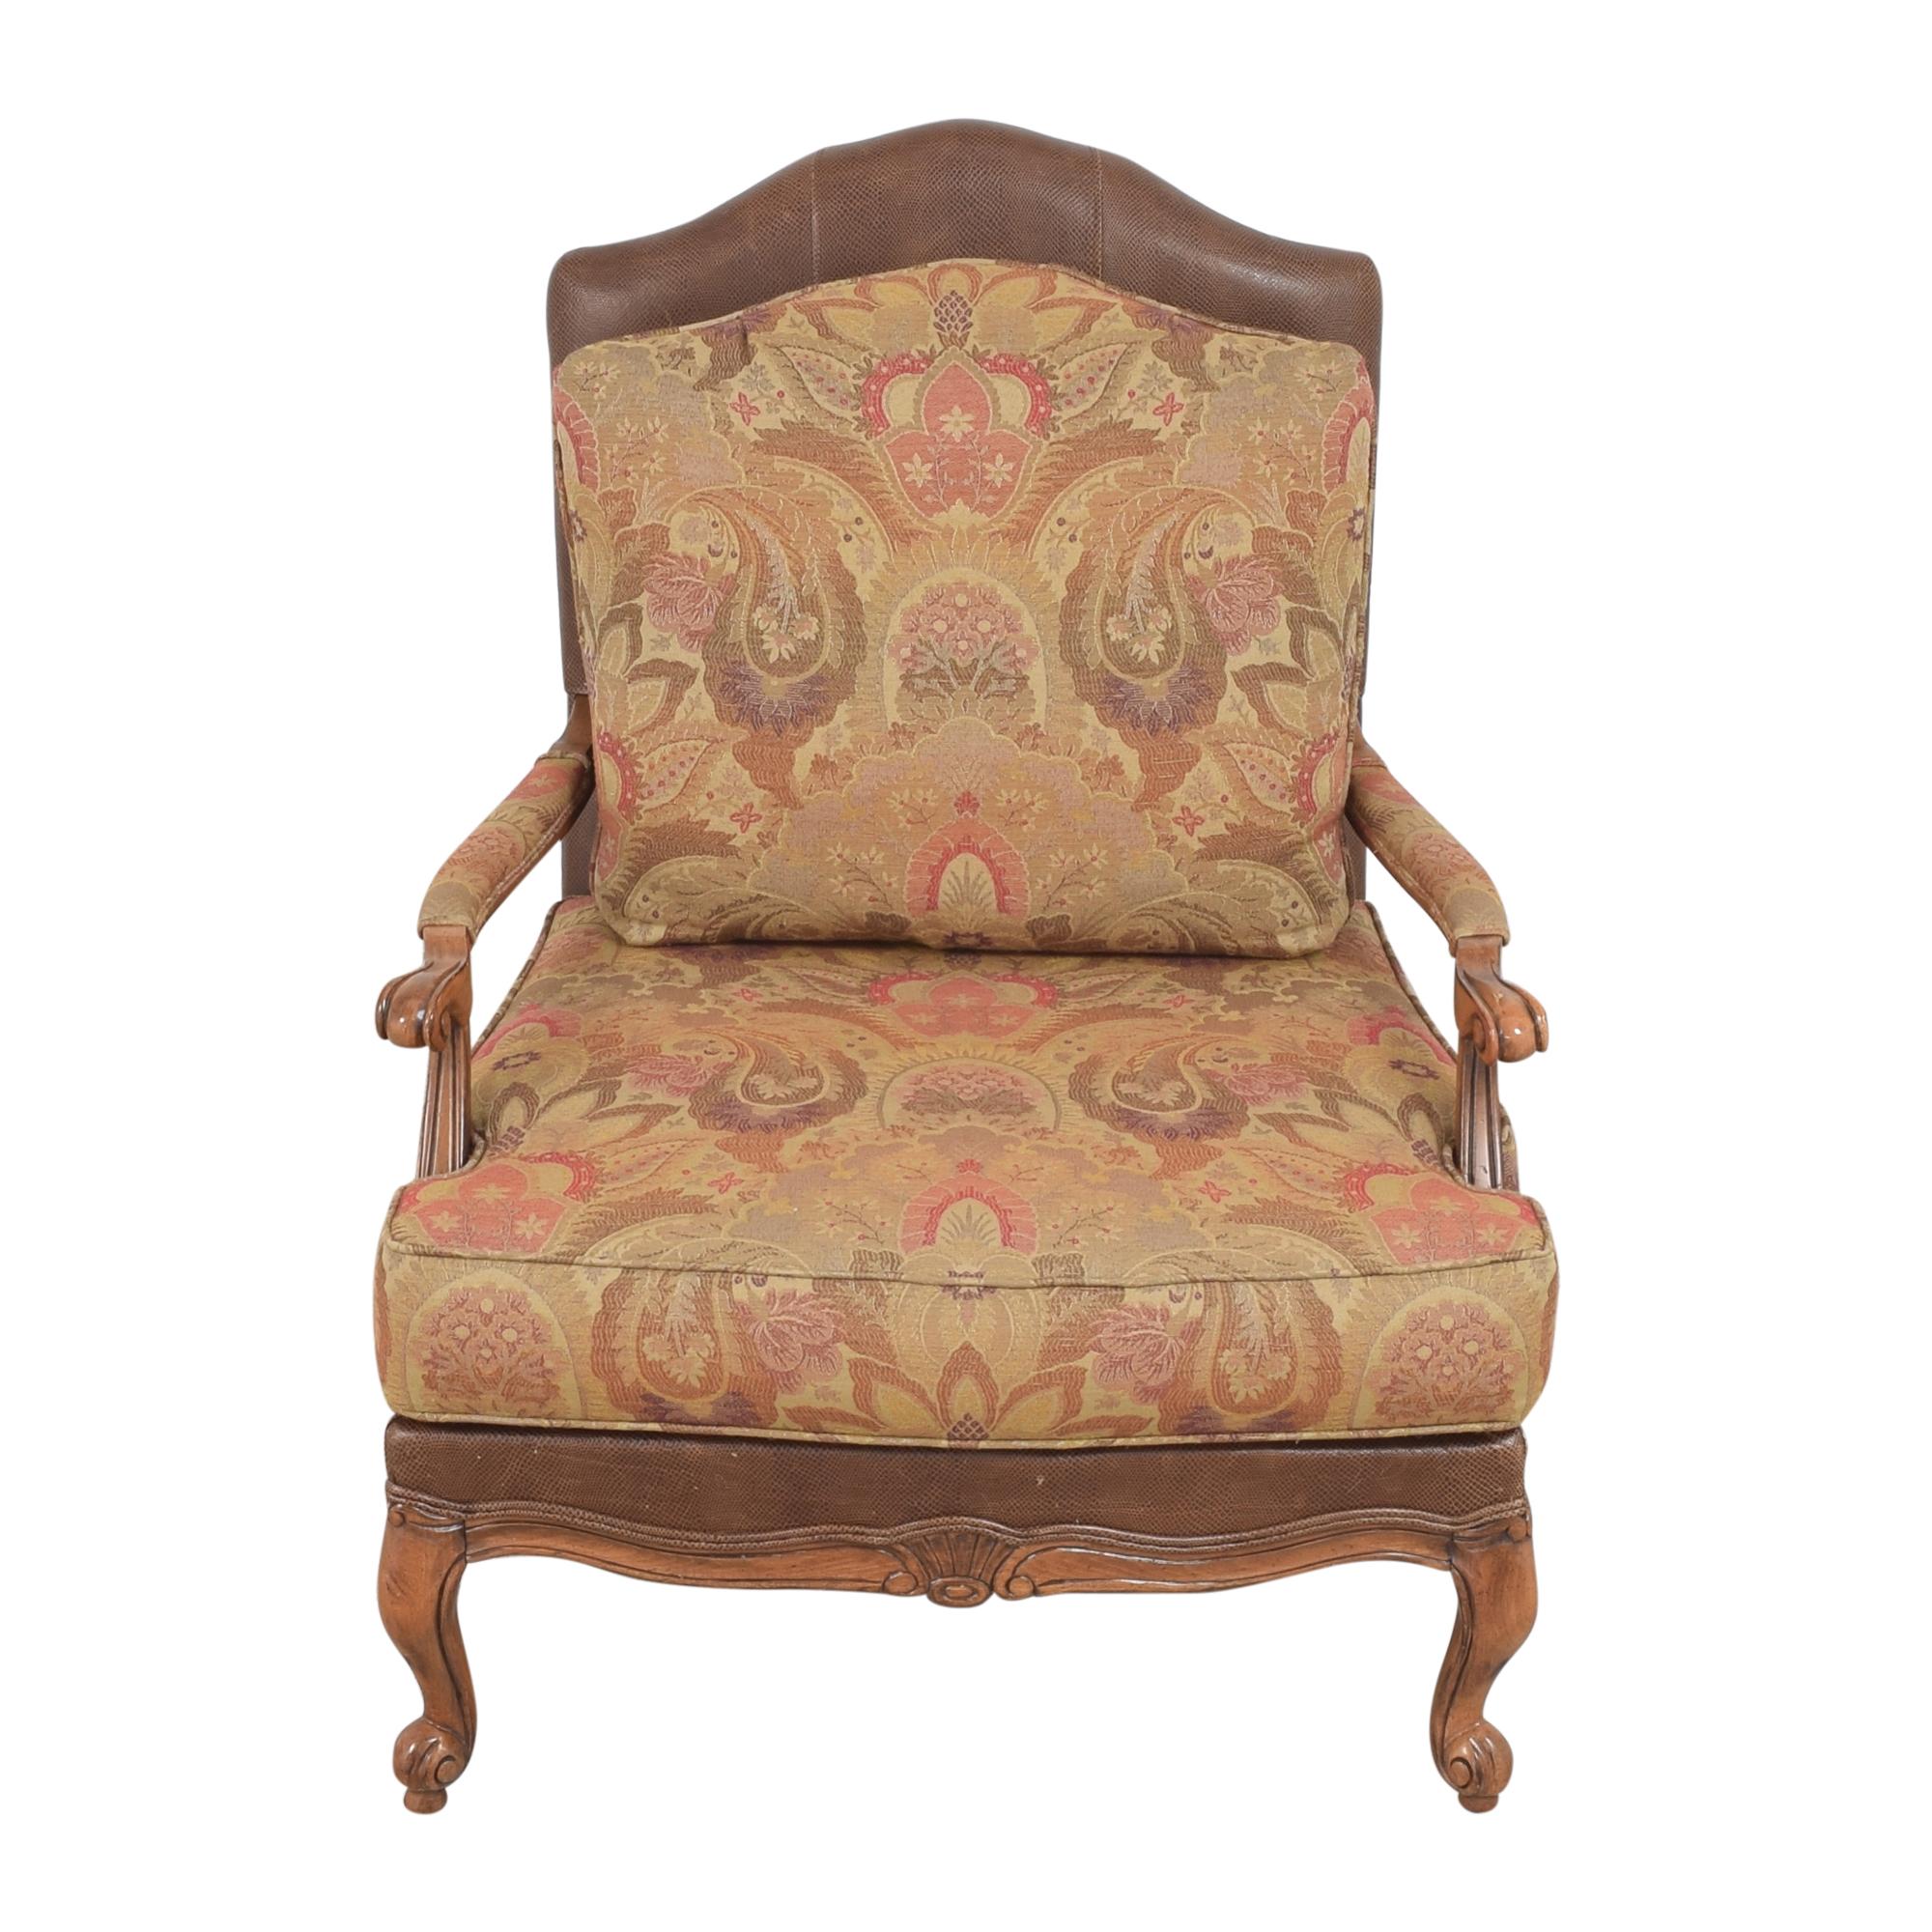 buy Ethan Allen Harris Chair Ethan Allen Chairs